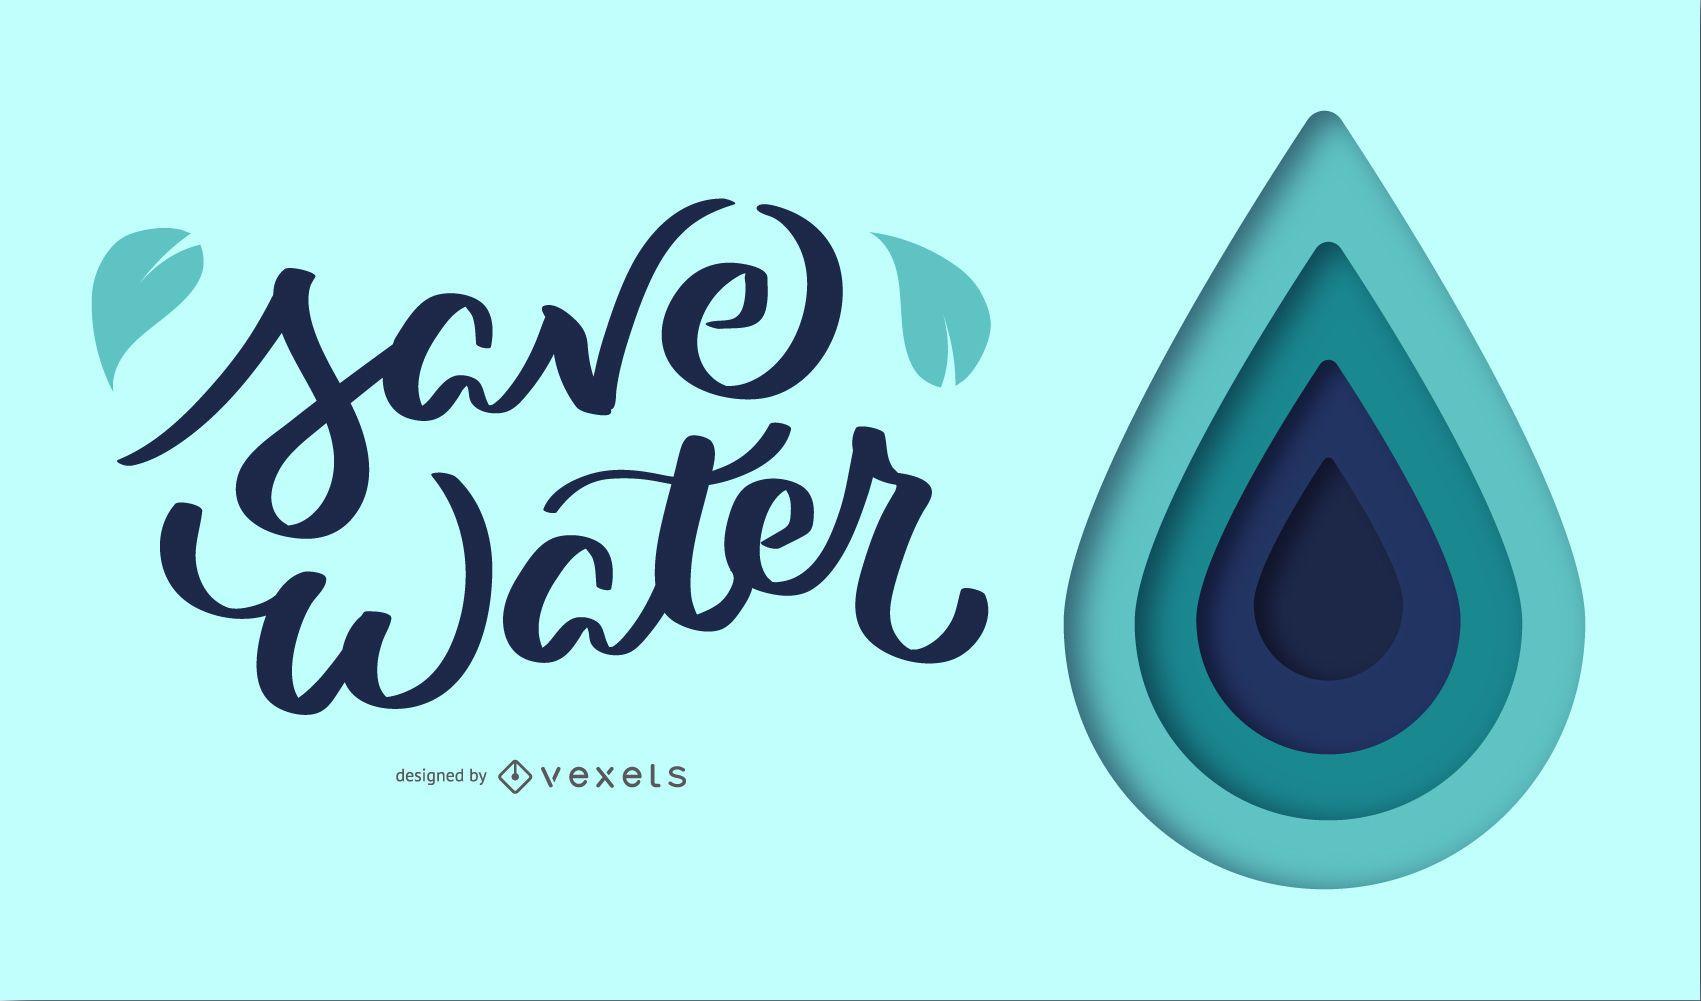 Save Water Illustration Design